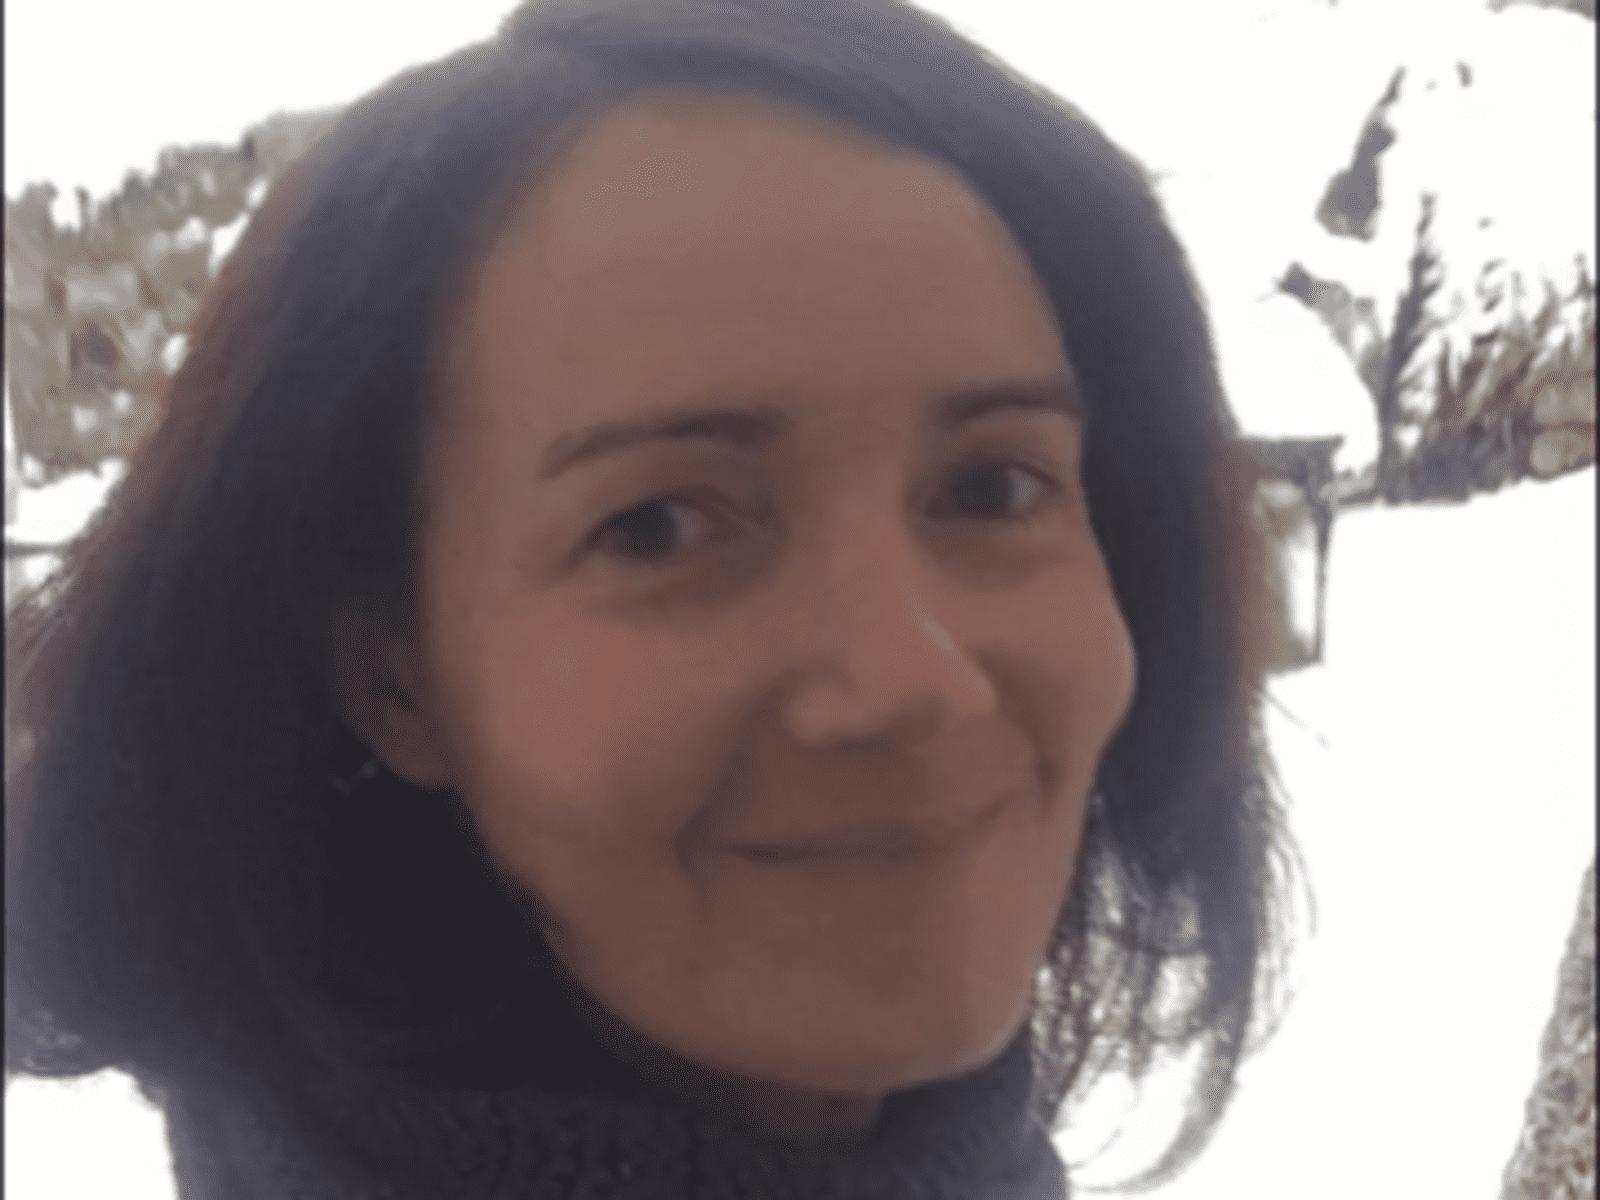 Aurore from London, United Kingdom